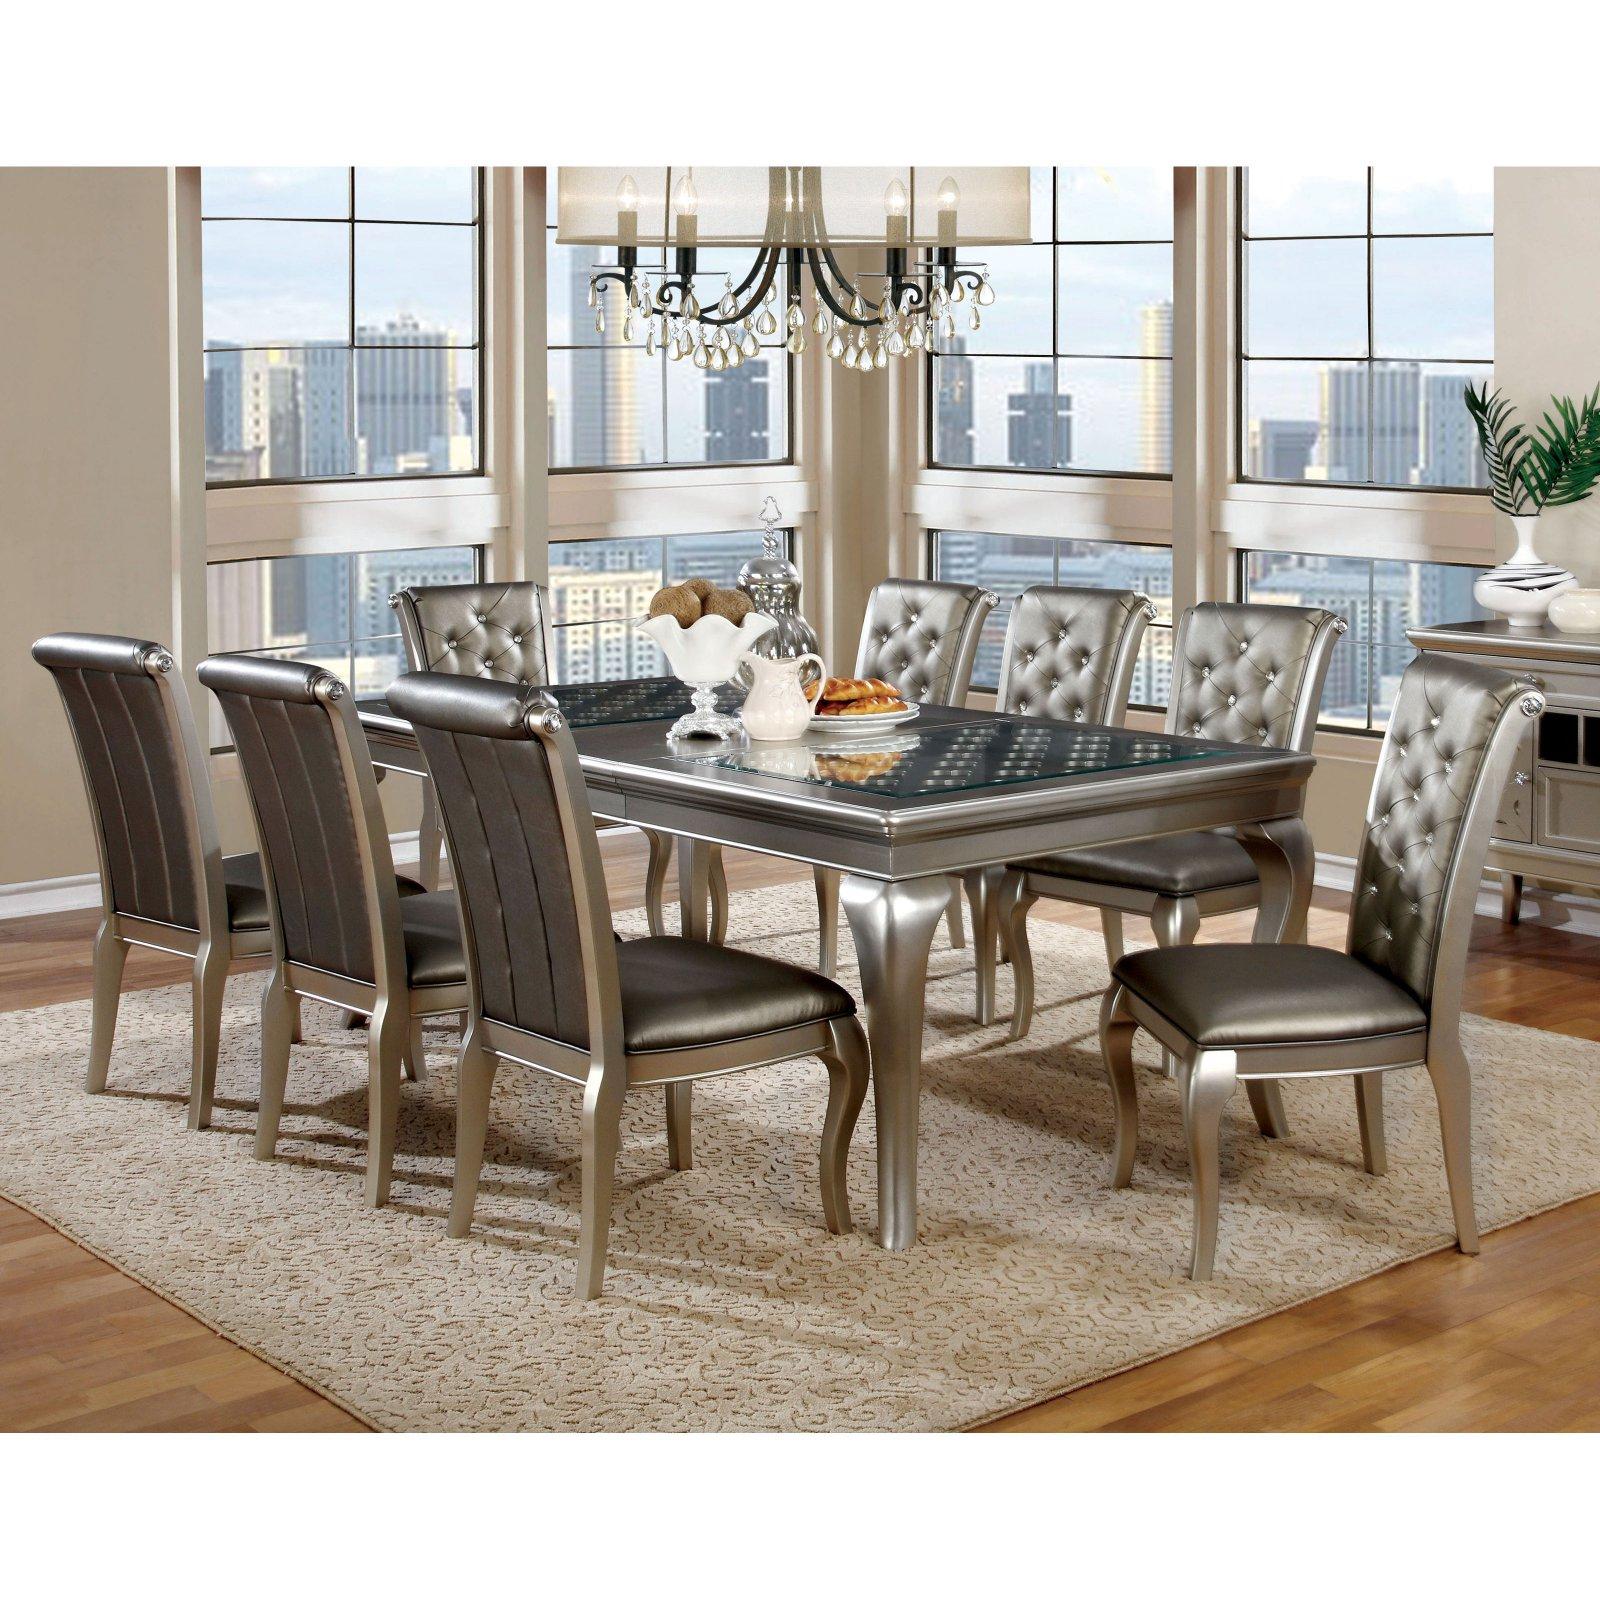 Furniture of America Sylera 9-Piece Dining Set